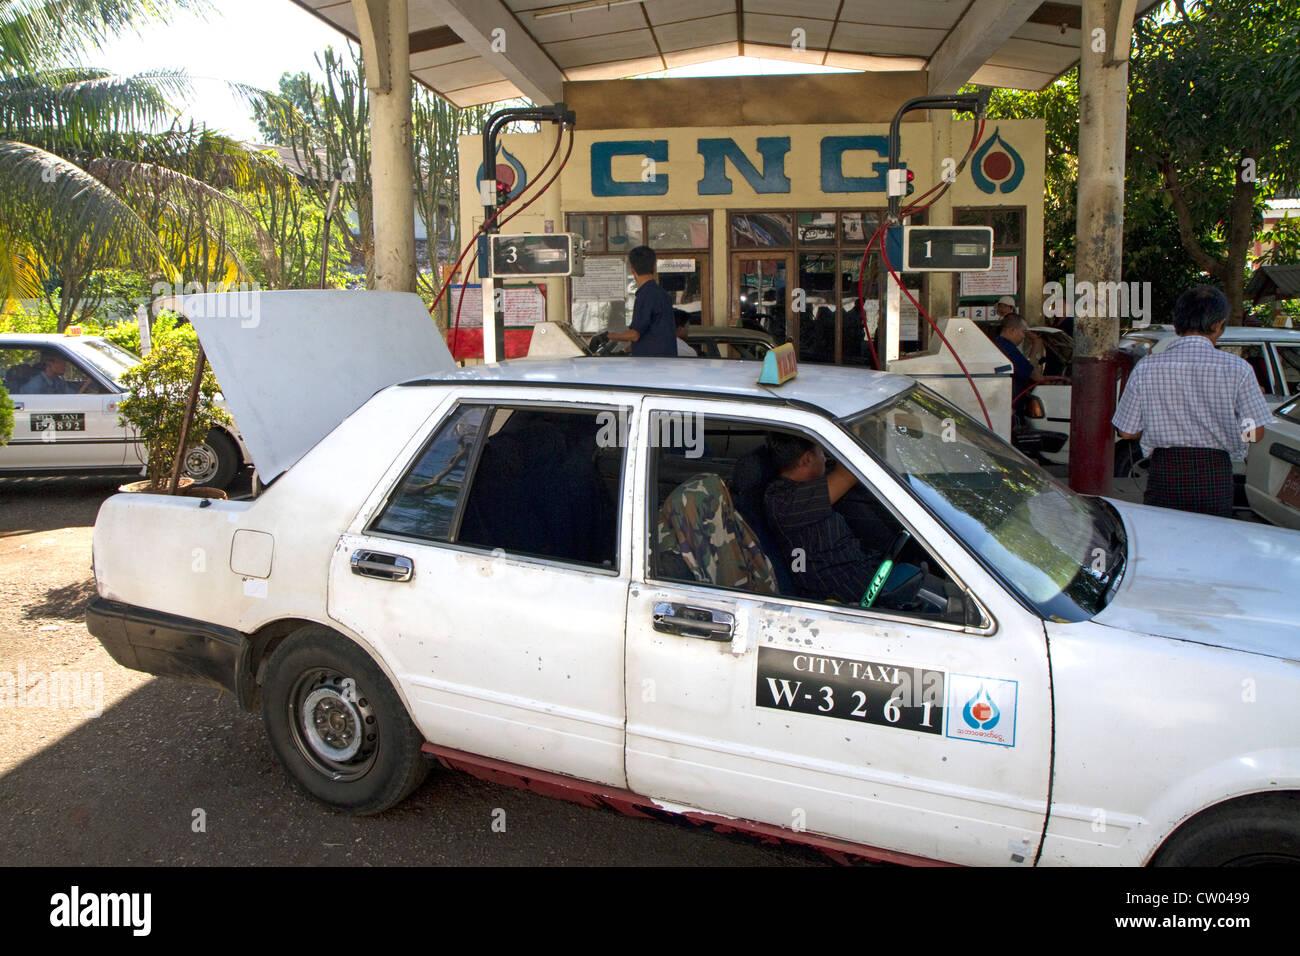 Compressed natural gas station in (Rangoon) Yangon, (Burma) Myanmar. - Stock Image